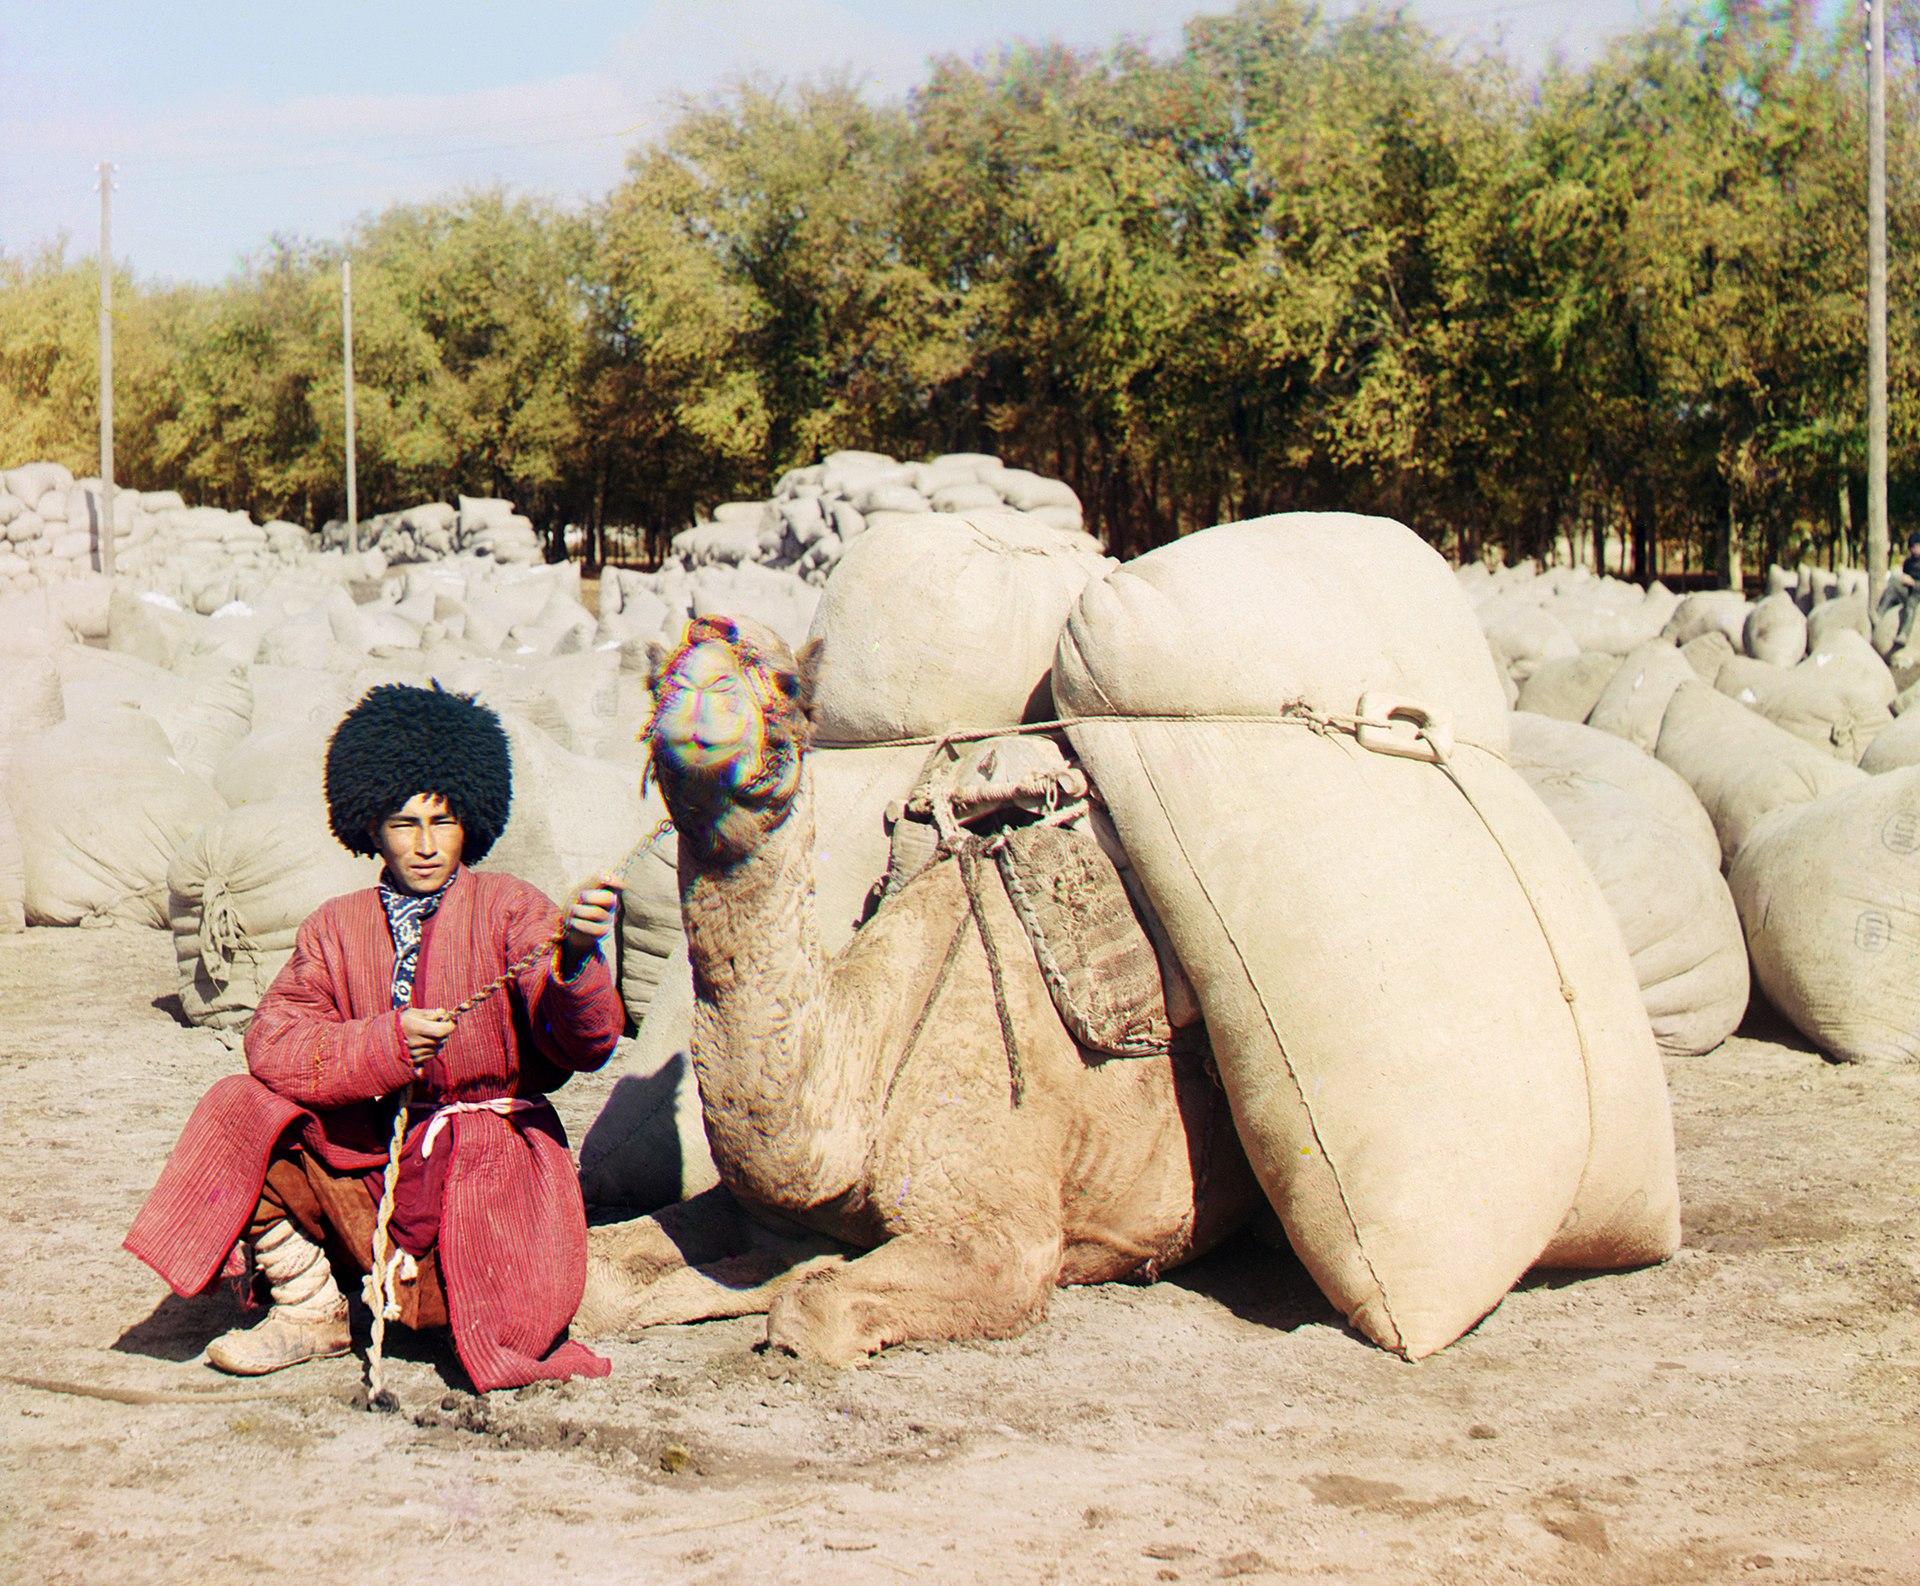 1920px-Turkmen_man_with_camel